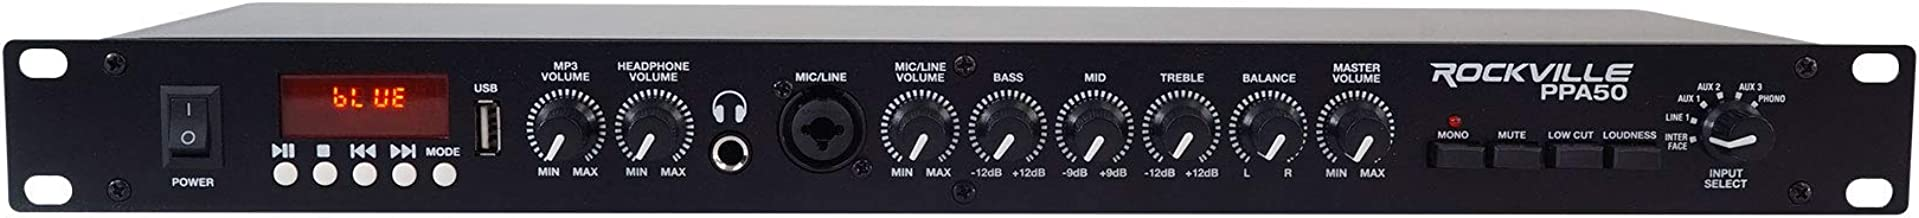 Rockville PPA50 Preamp Pro 1U Pre-Amplifier w/Bluetooth/USB/Computer Interface